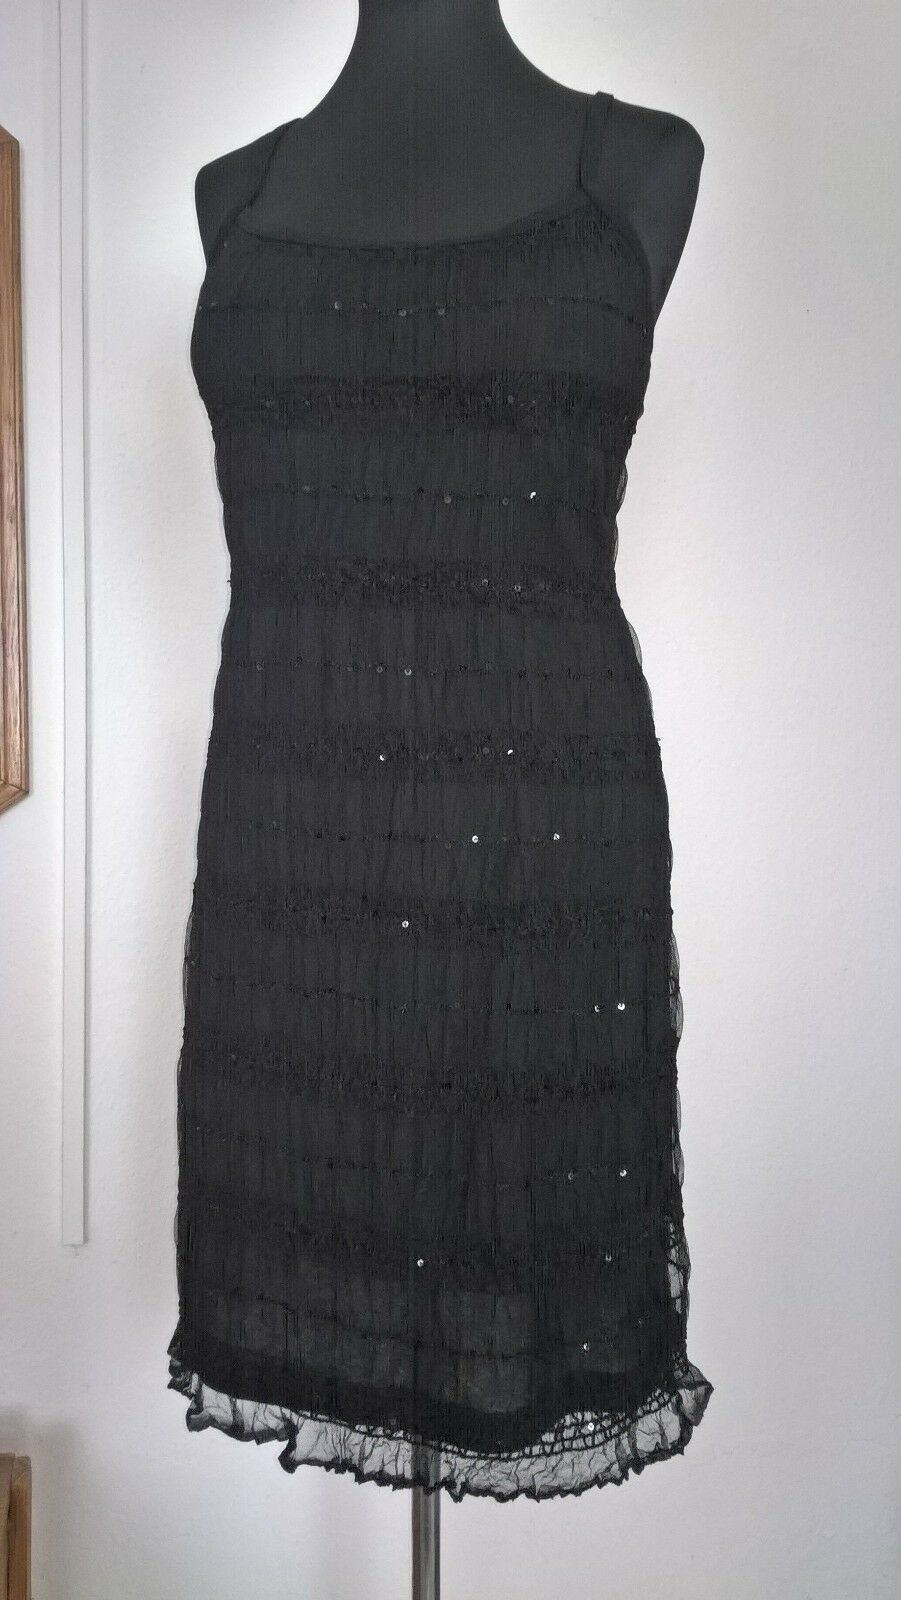 NEU NEU NEU Spitzen Kleid,ABENDKLEID,schwarz Gr.40,knielang,Sommerkleid,Trägerkleid NEU   Optimaler Preis    Langfristiger Ruf    Verrückter Preis  551cd4